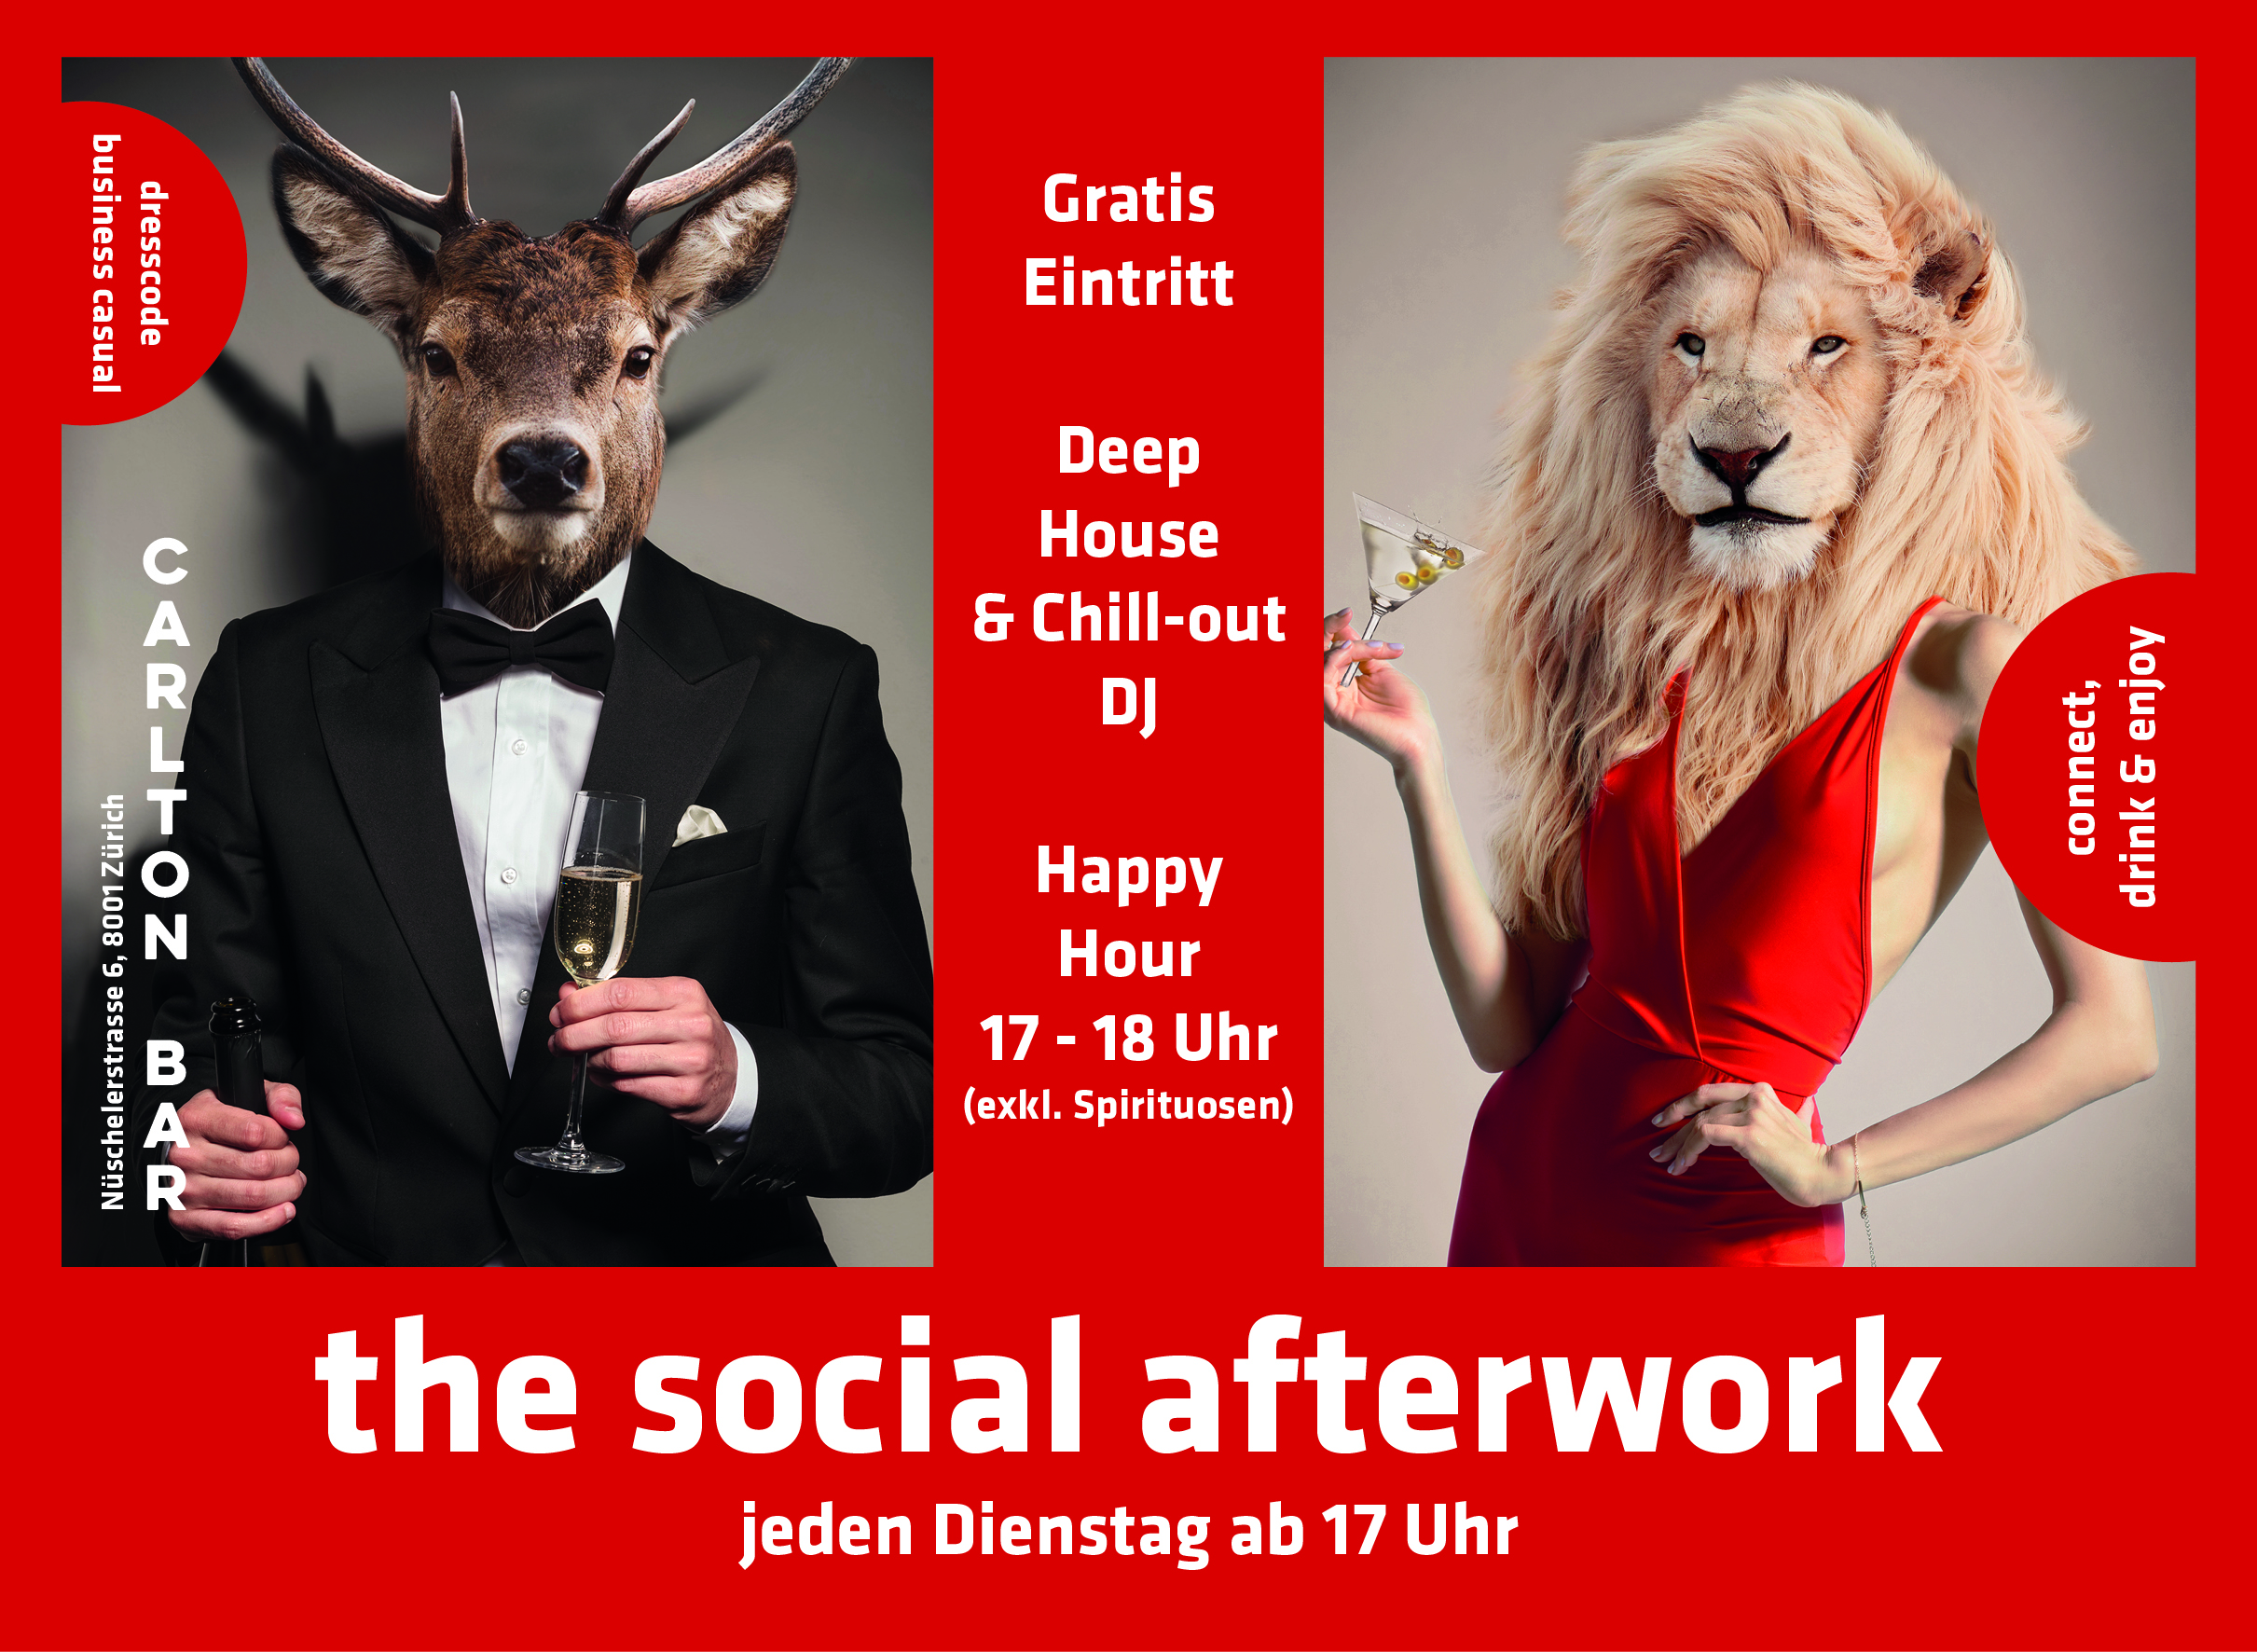 THE SOCIAL AFTERWORK